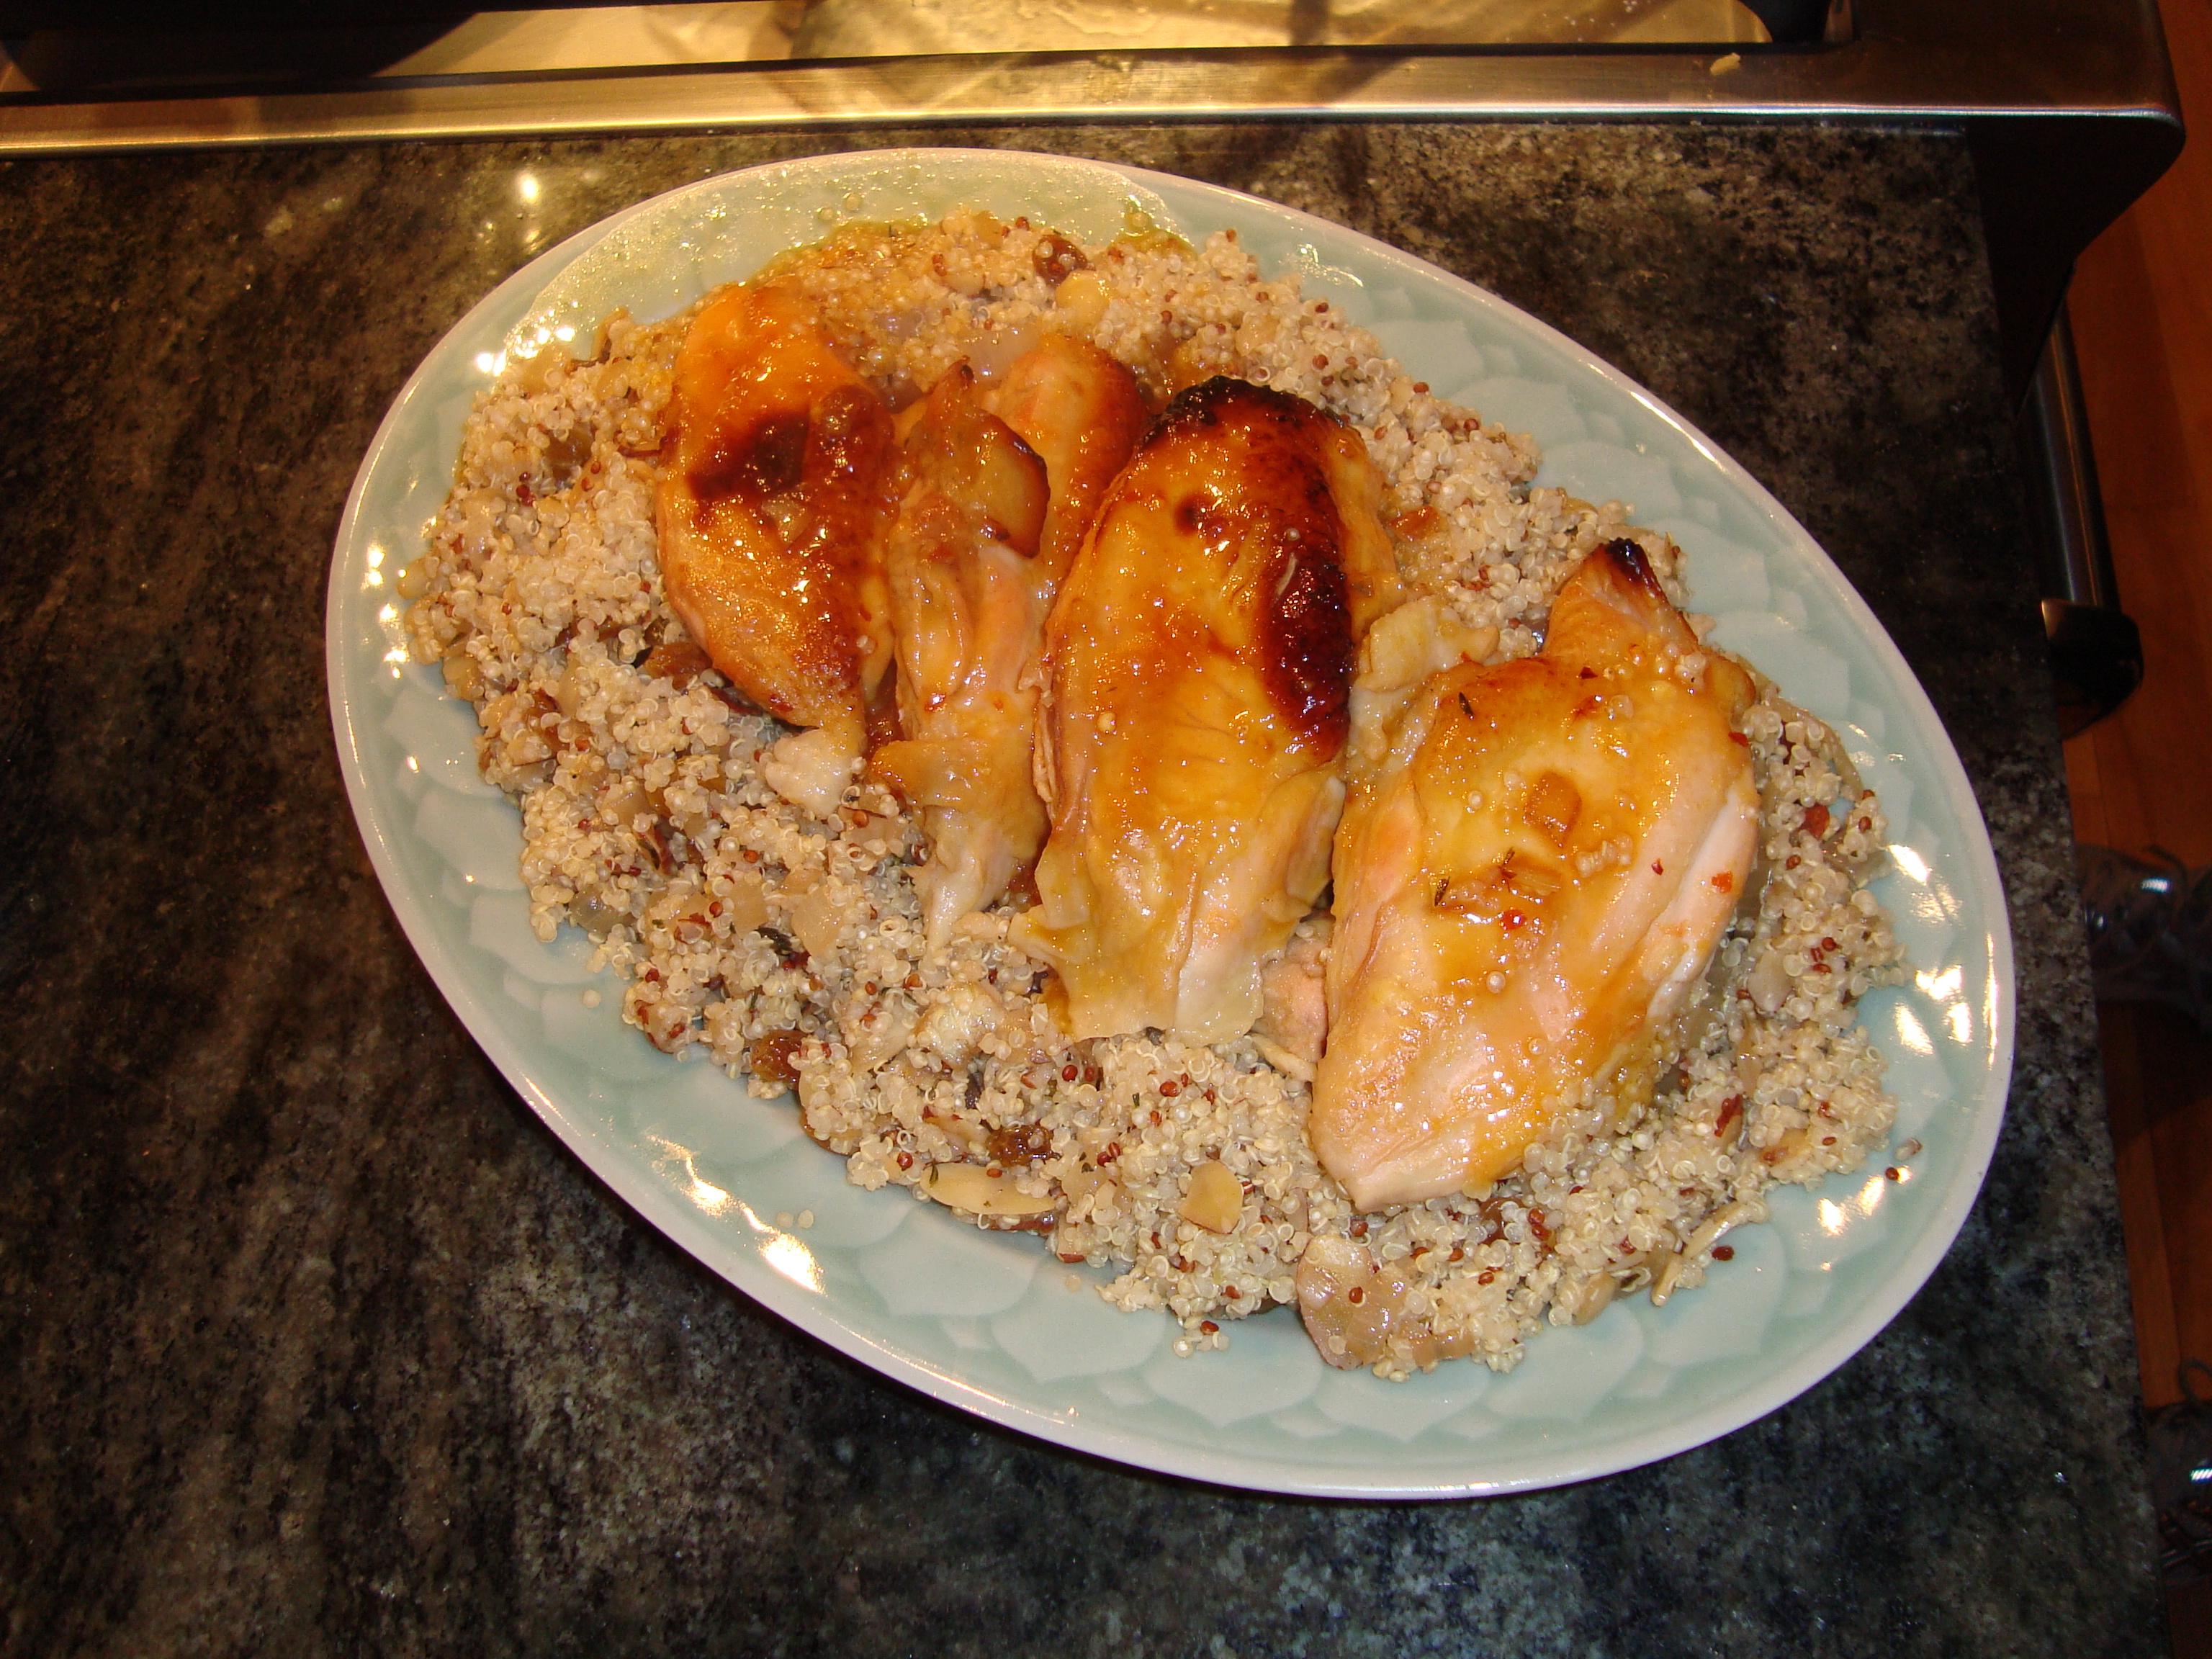 Baked Israeli Chicken in Sherried Citrus Juice